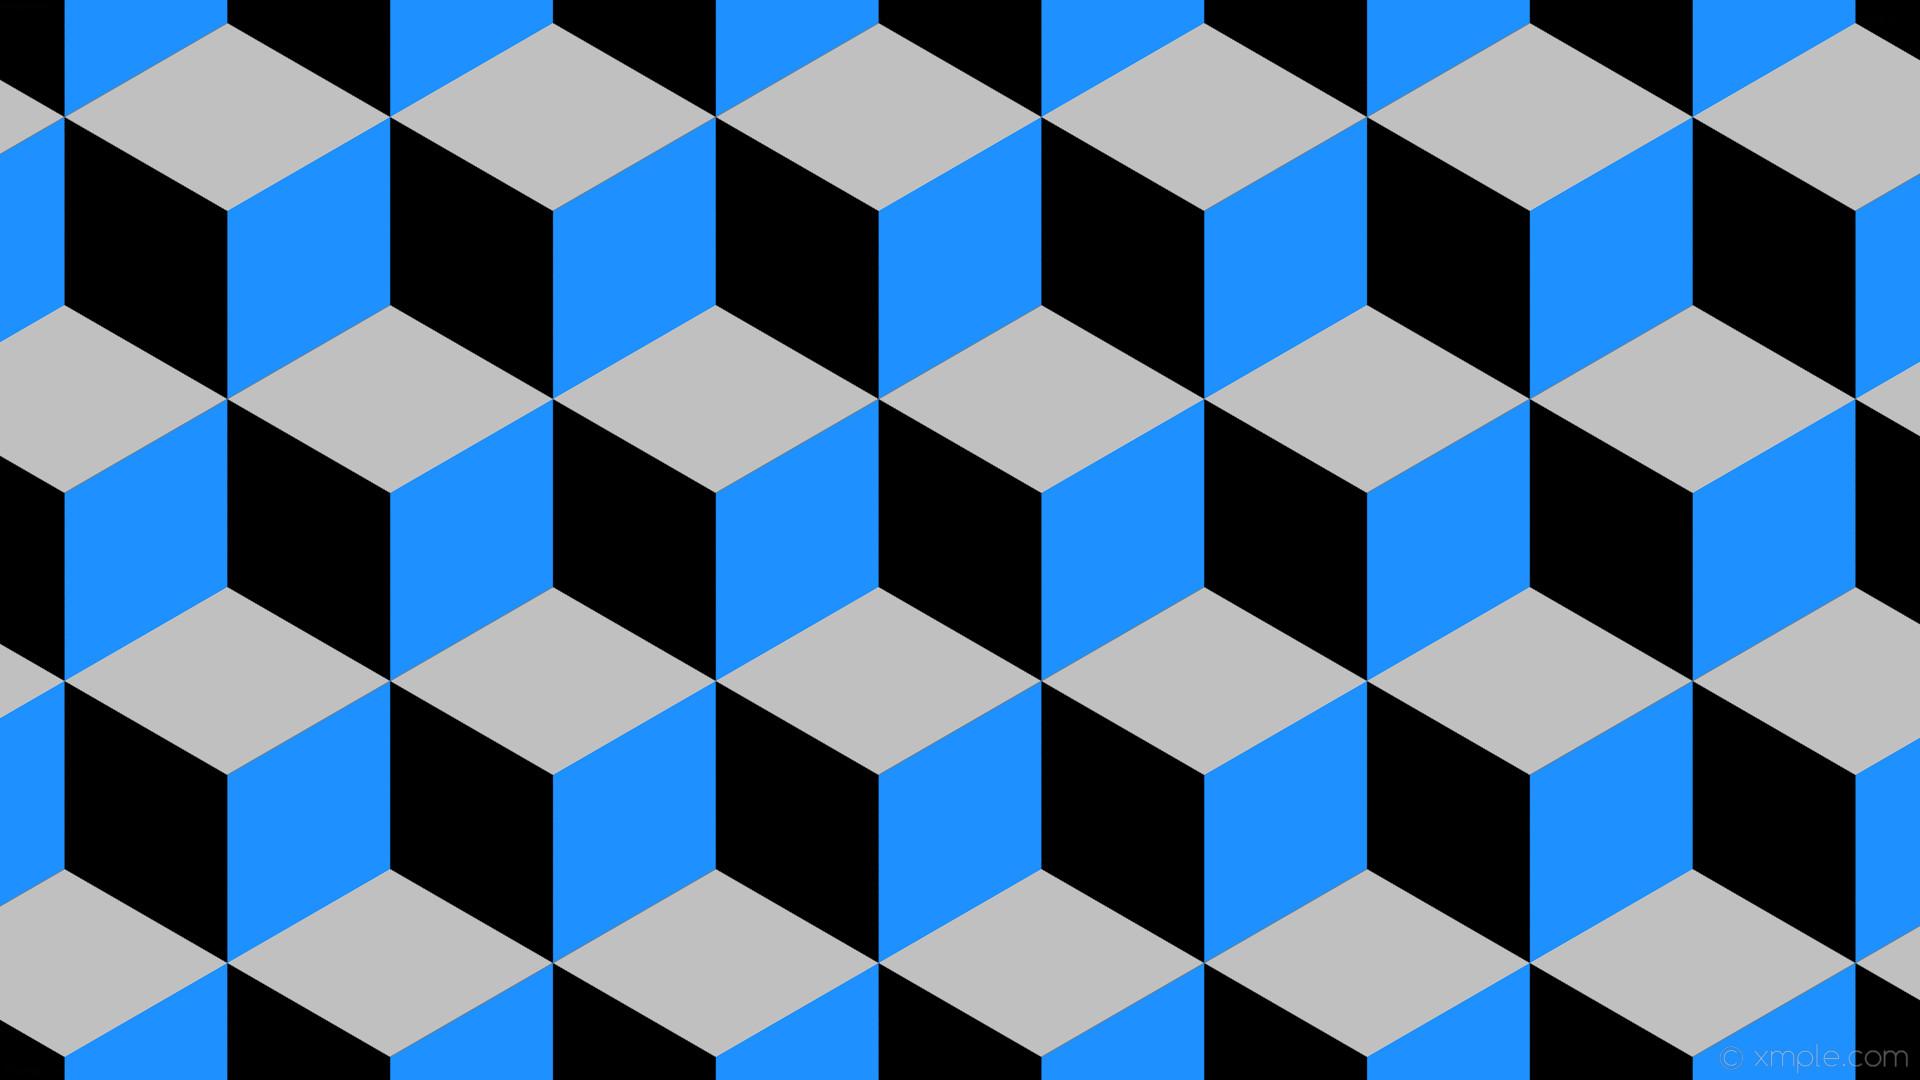 wallpaper grey 3d cubes blue black dodger blue silver #000000 #1e90ff  #c0c0c0 300